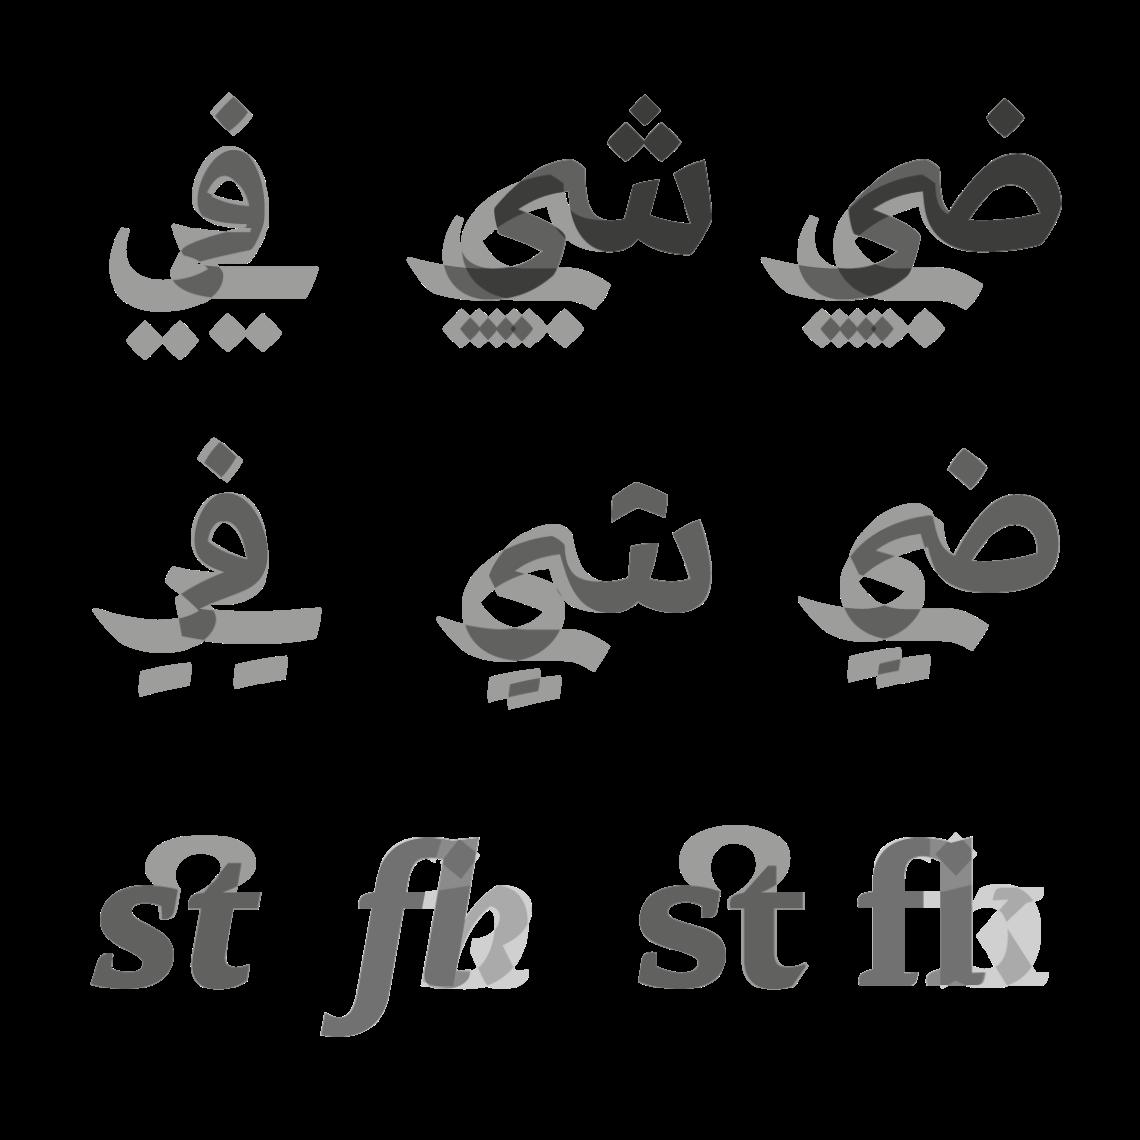 29LT-Zarid-Text-Image-11